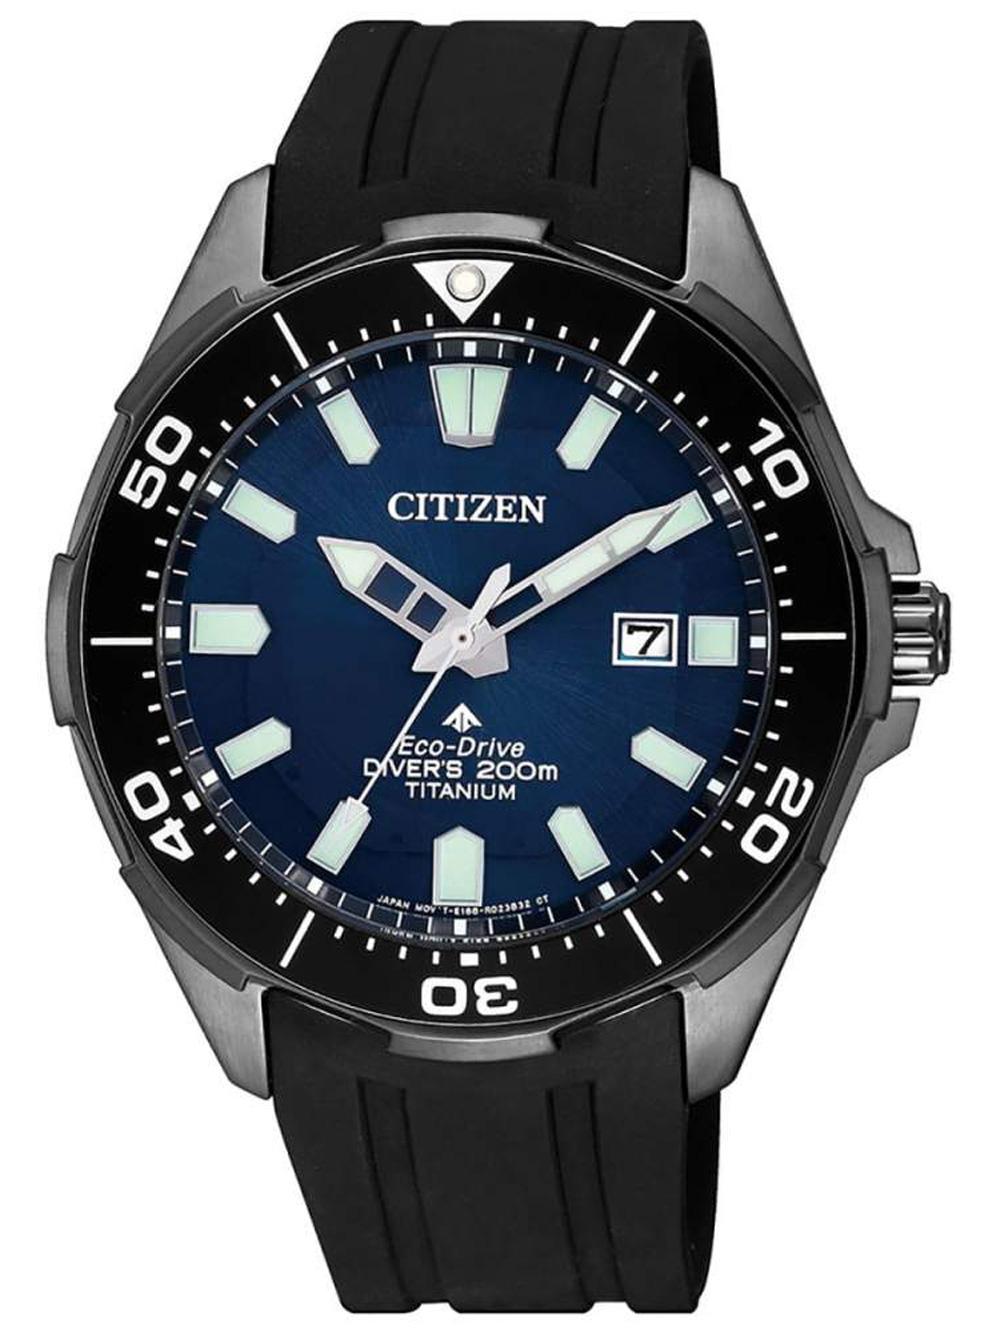 Citizen Armbanduhren Im Outlet Kaufen Armbanduhrenhaus Ep6050 17e Promaster Eco Drive Ladies Bn0205 10l Super Titanium 44mm 20atm